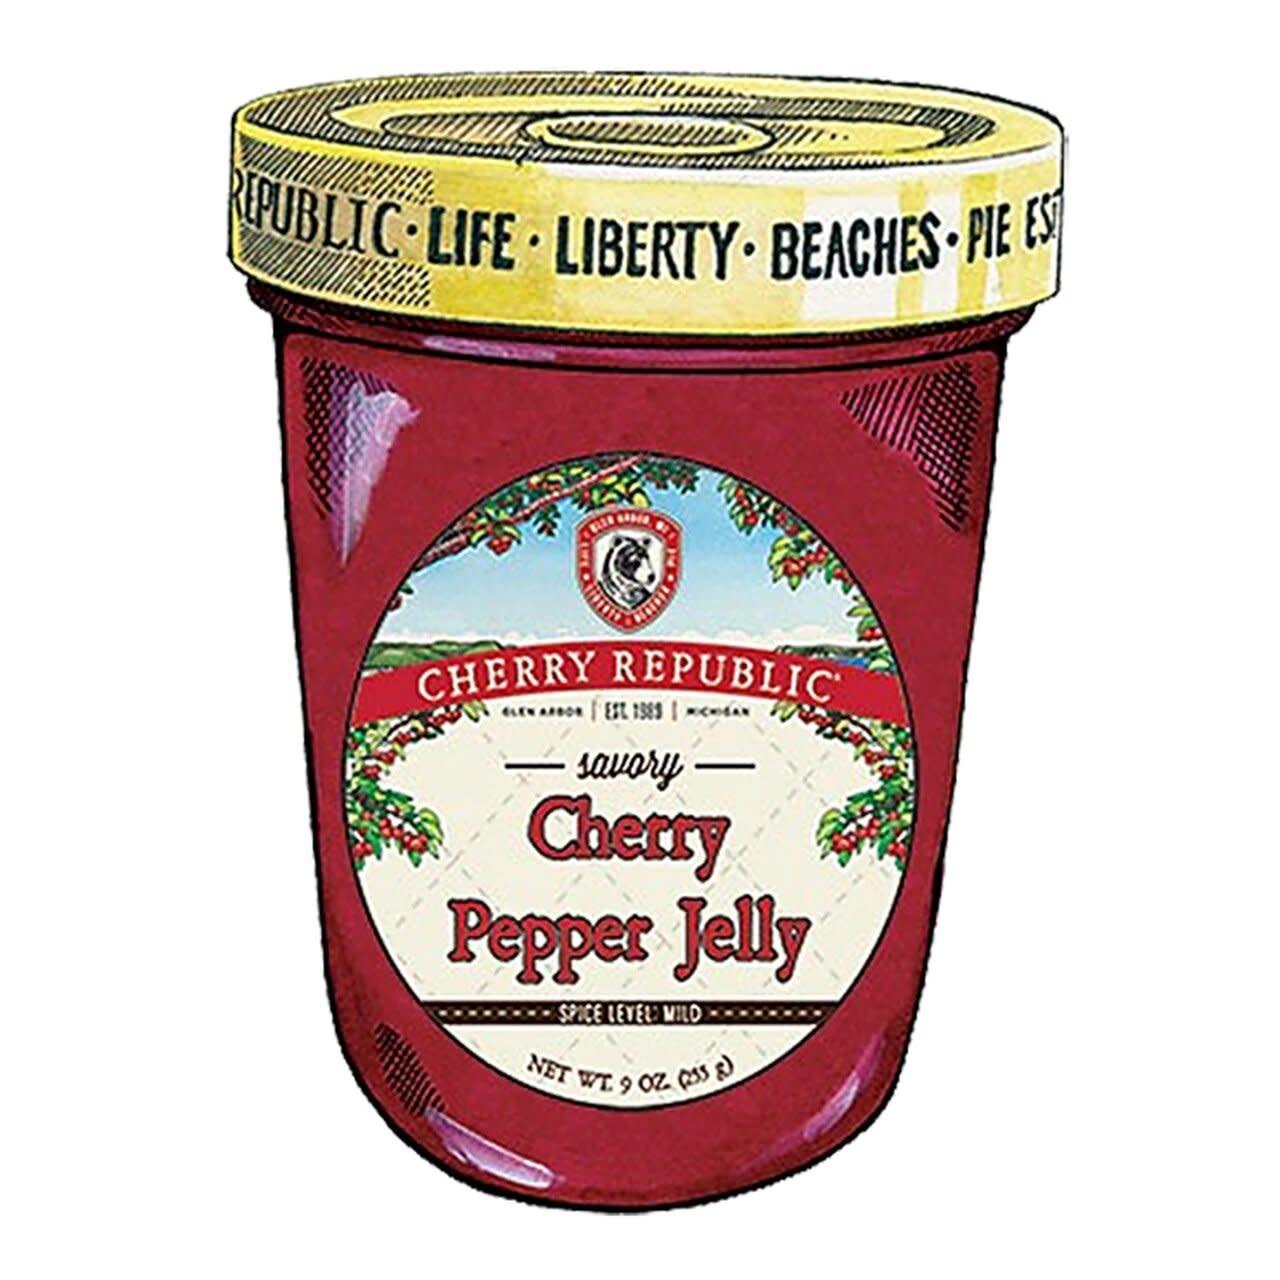 Cherry Republic Cherry Republic Cherry Pepper Jelly 8.5oz